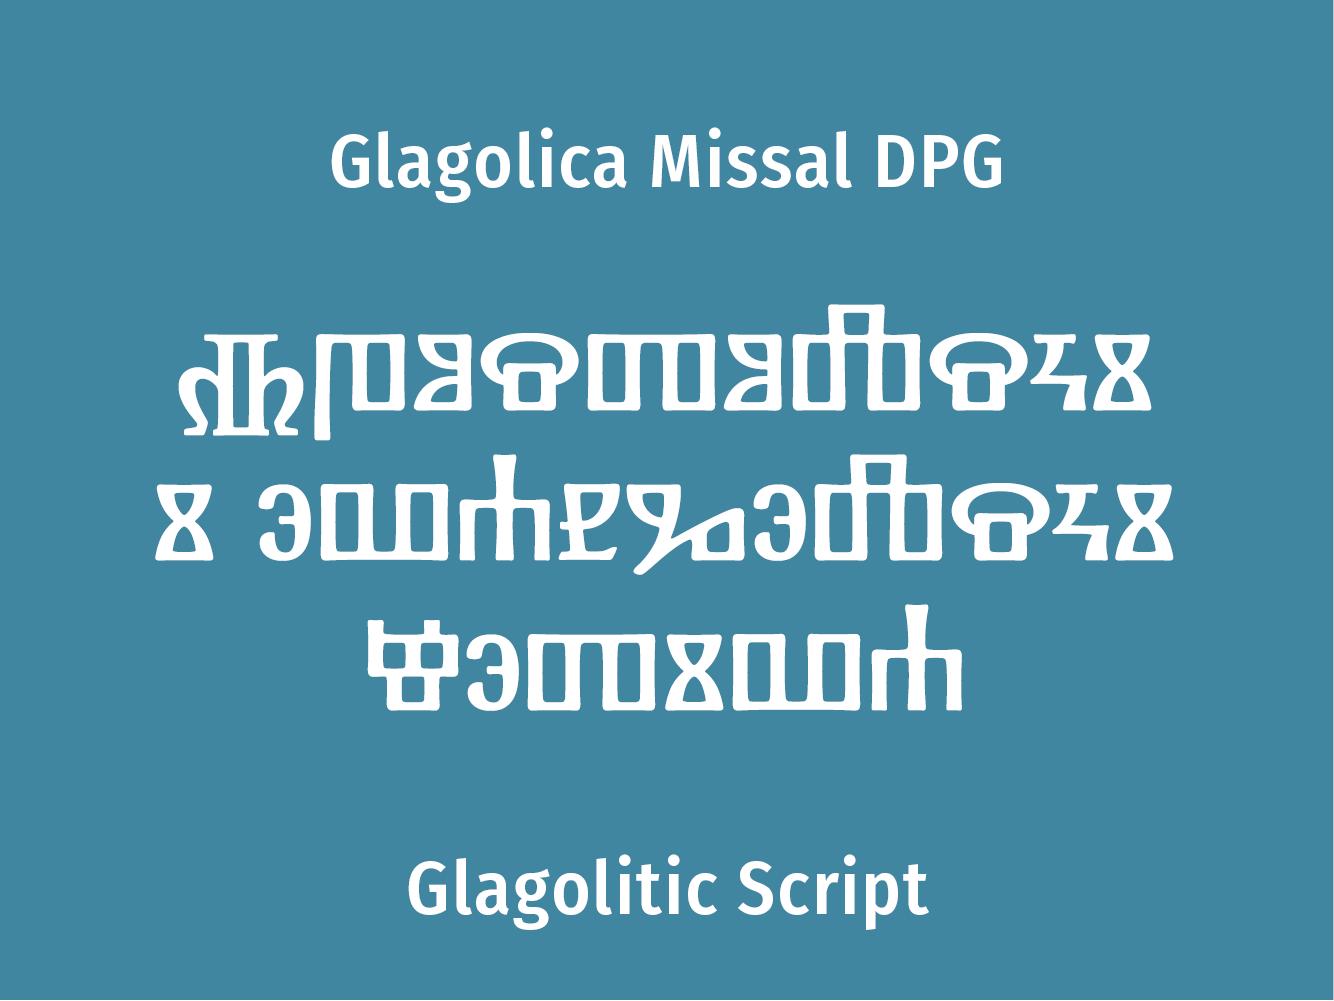 Glagolica Missal DPG